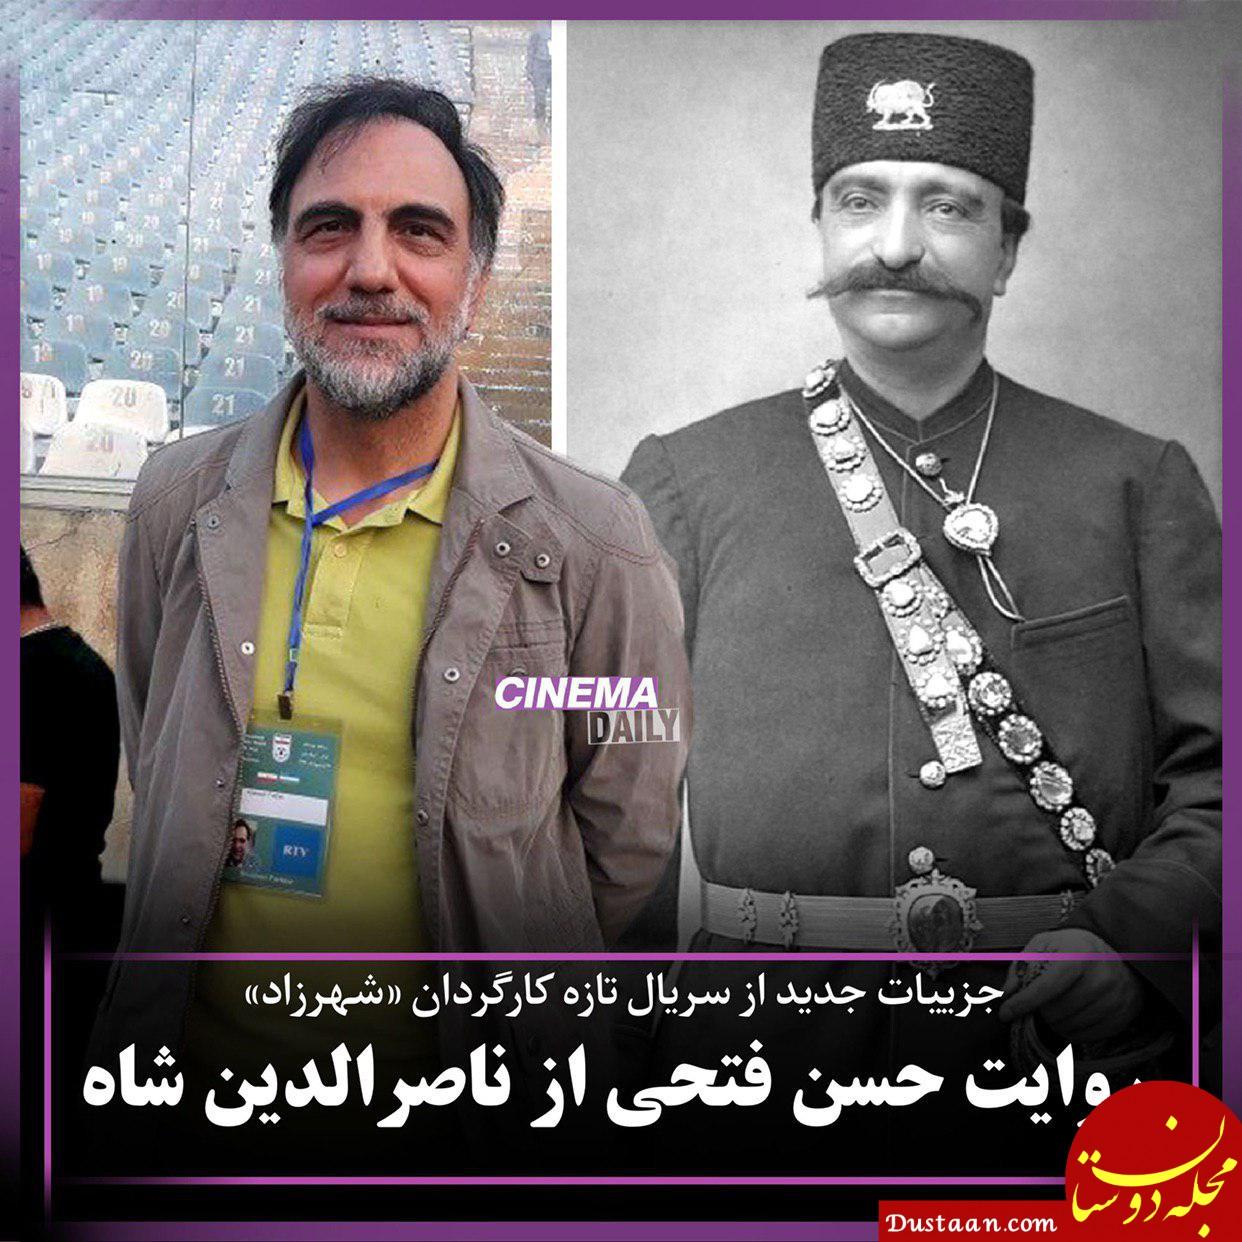 www.dustaan.com روایت حسن فتحی از ناصرالدین شاه